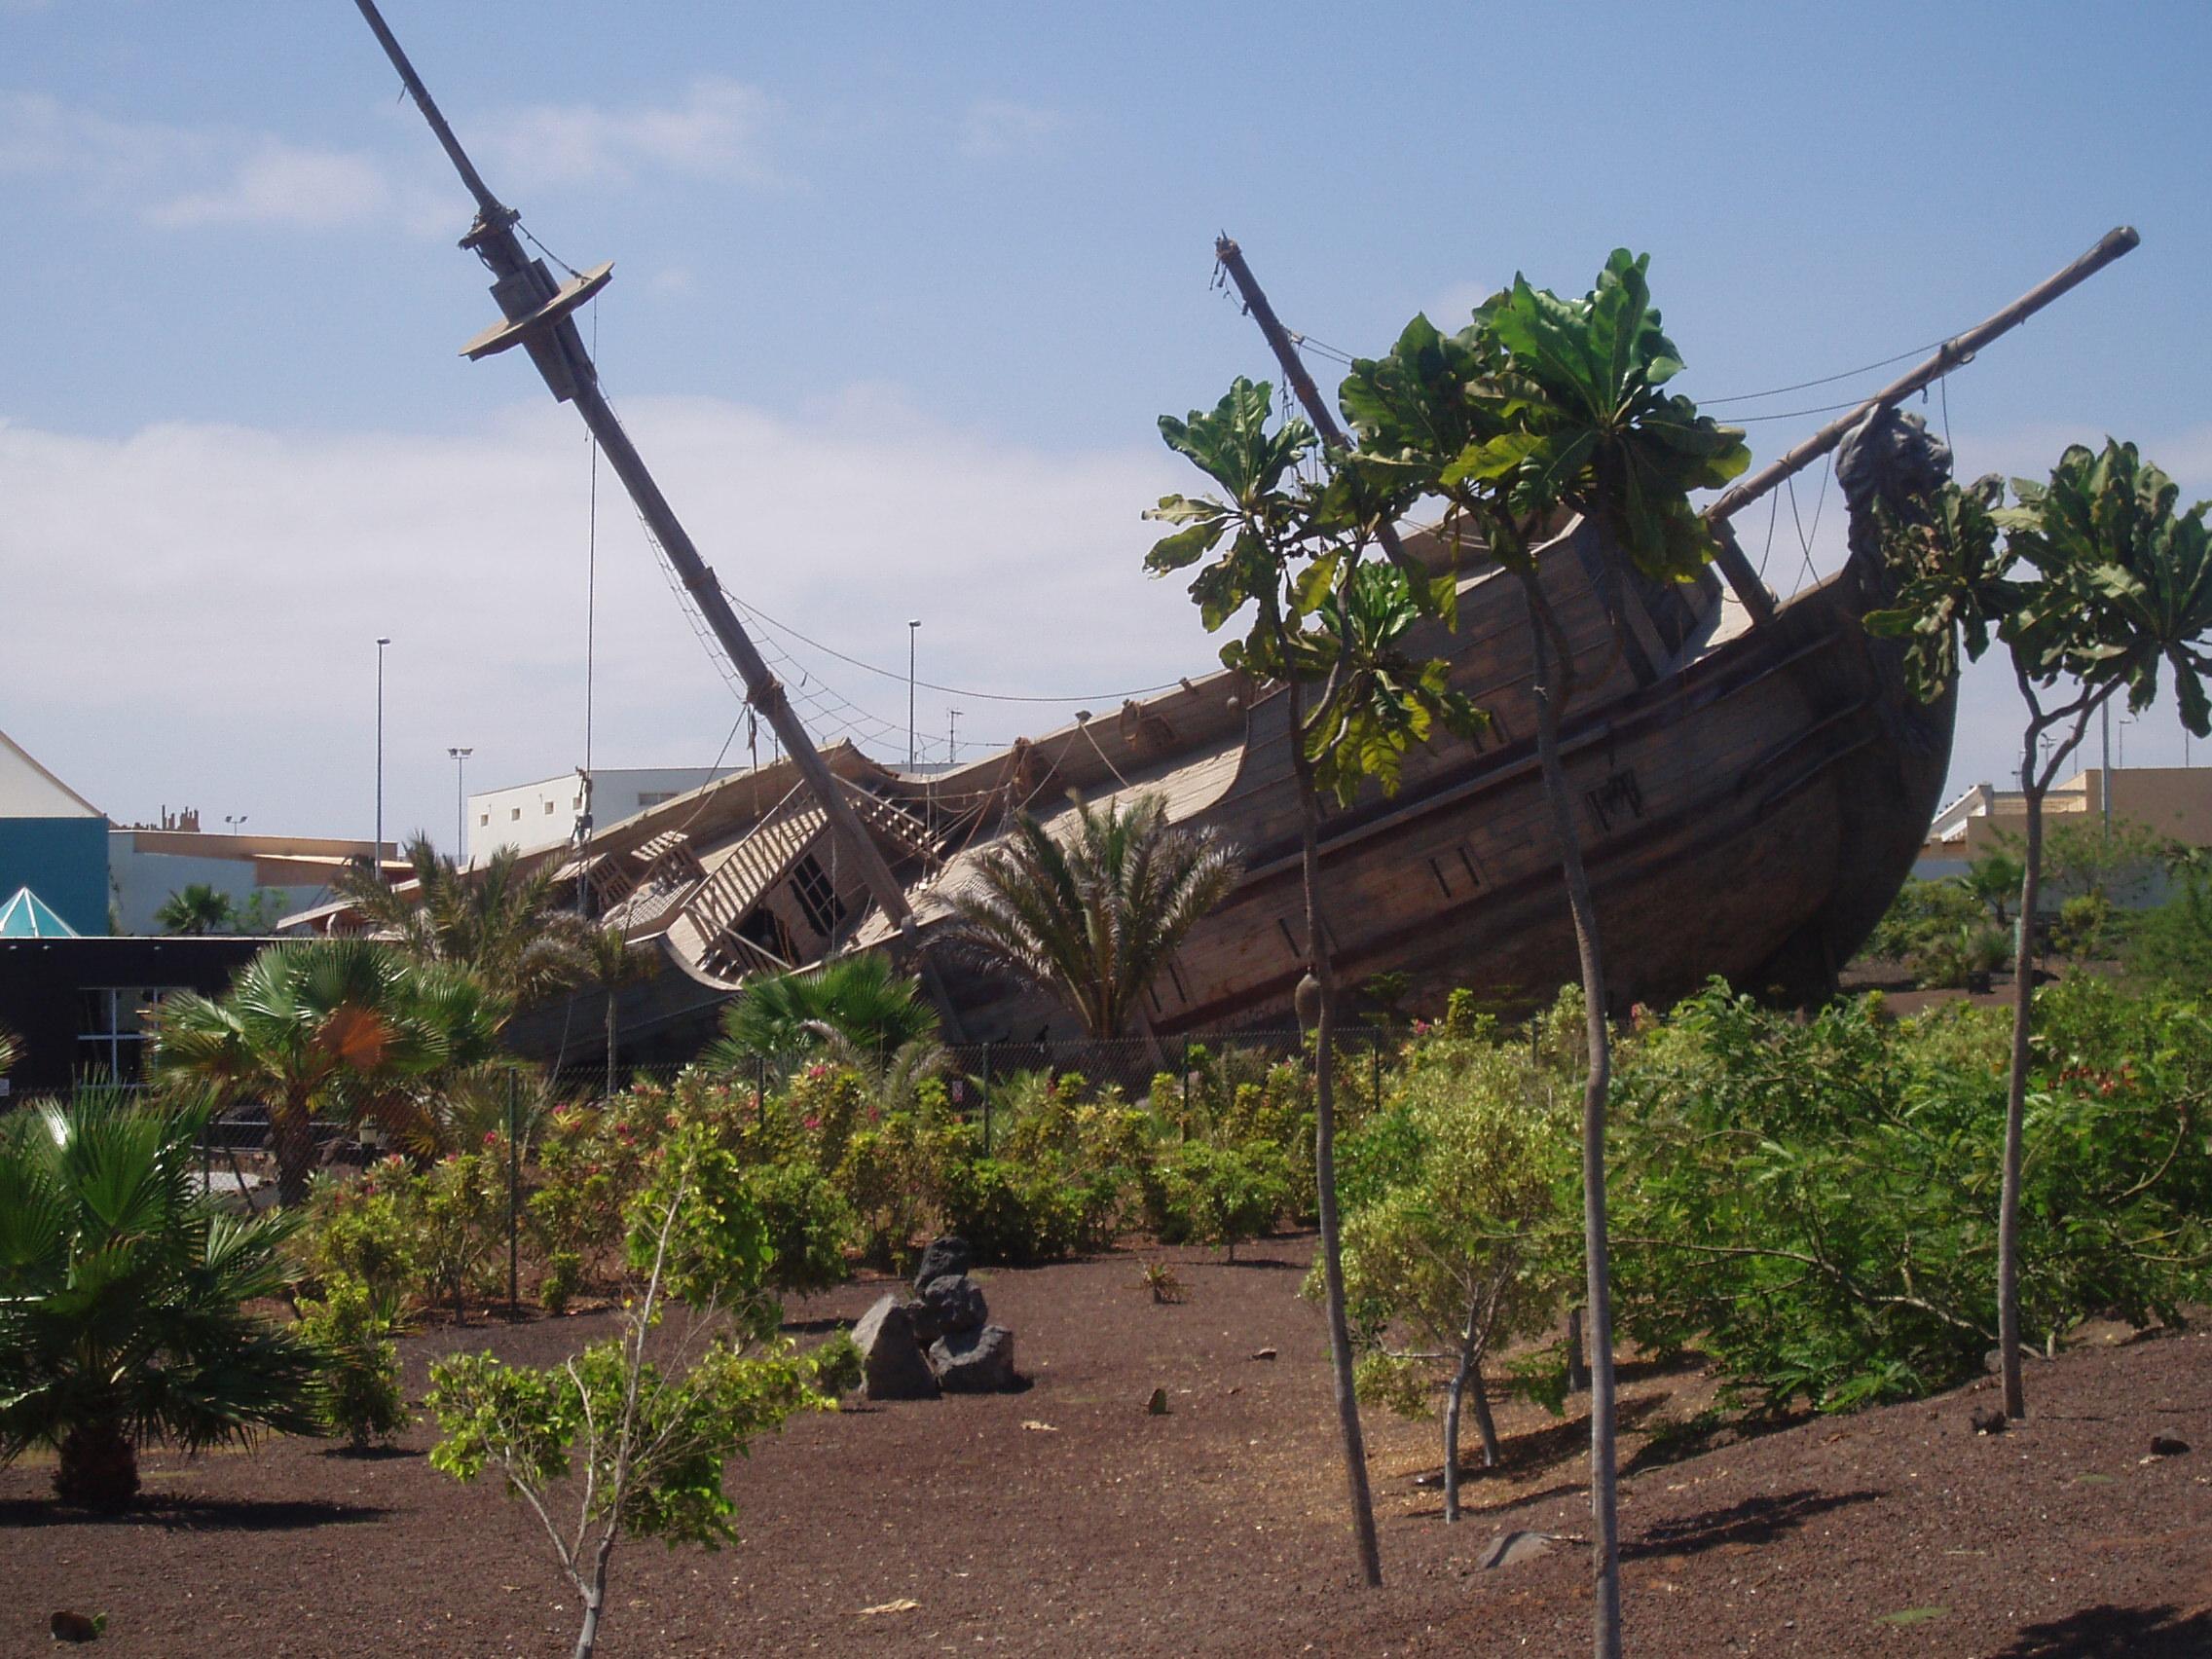 15 au 29 août 09 Fuerté Lanzarote 071 - Fuerteventura